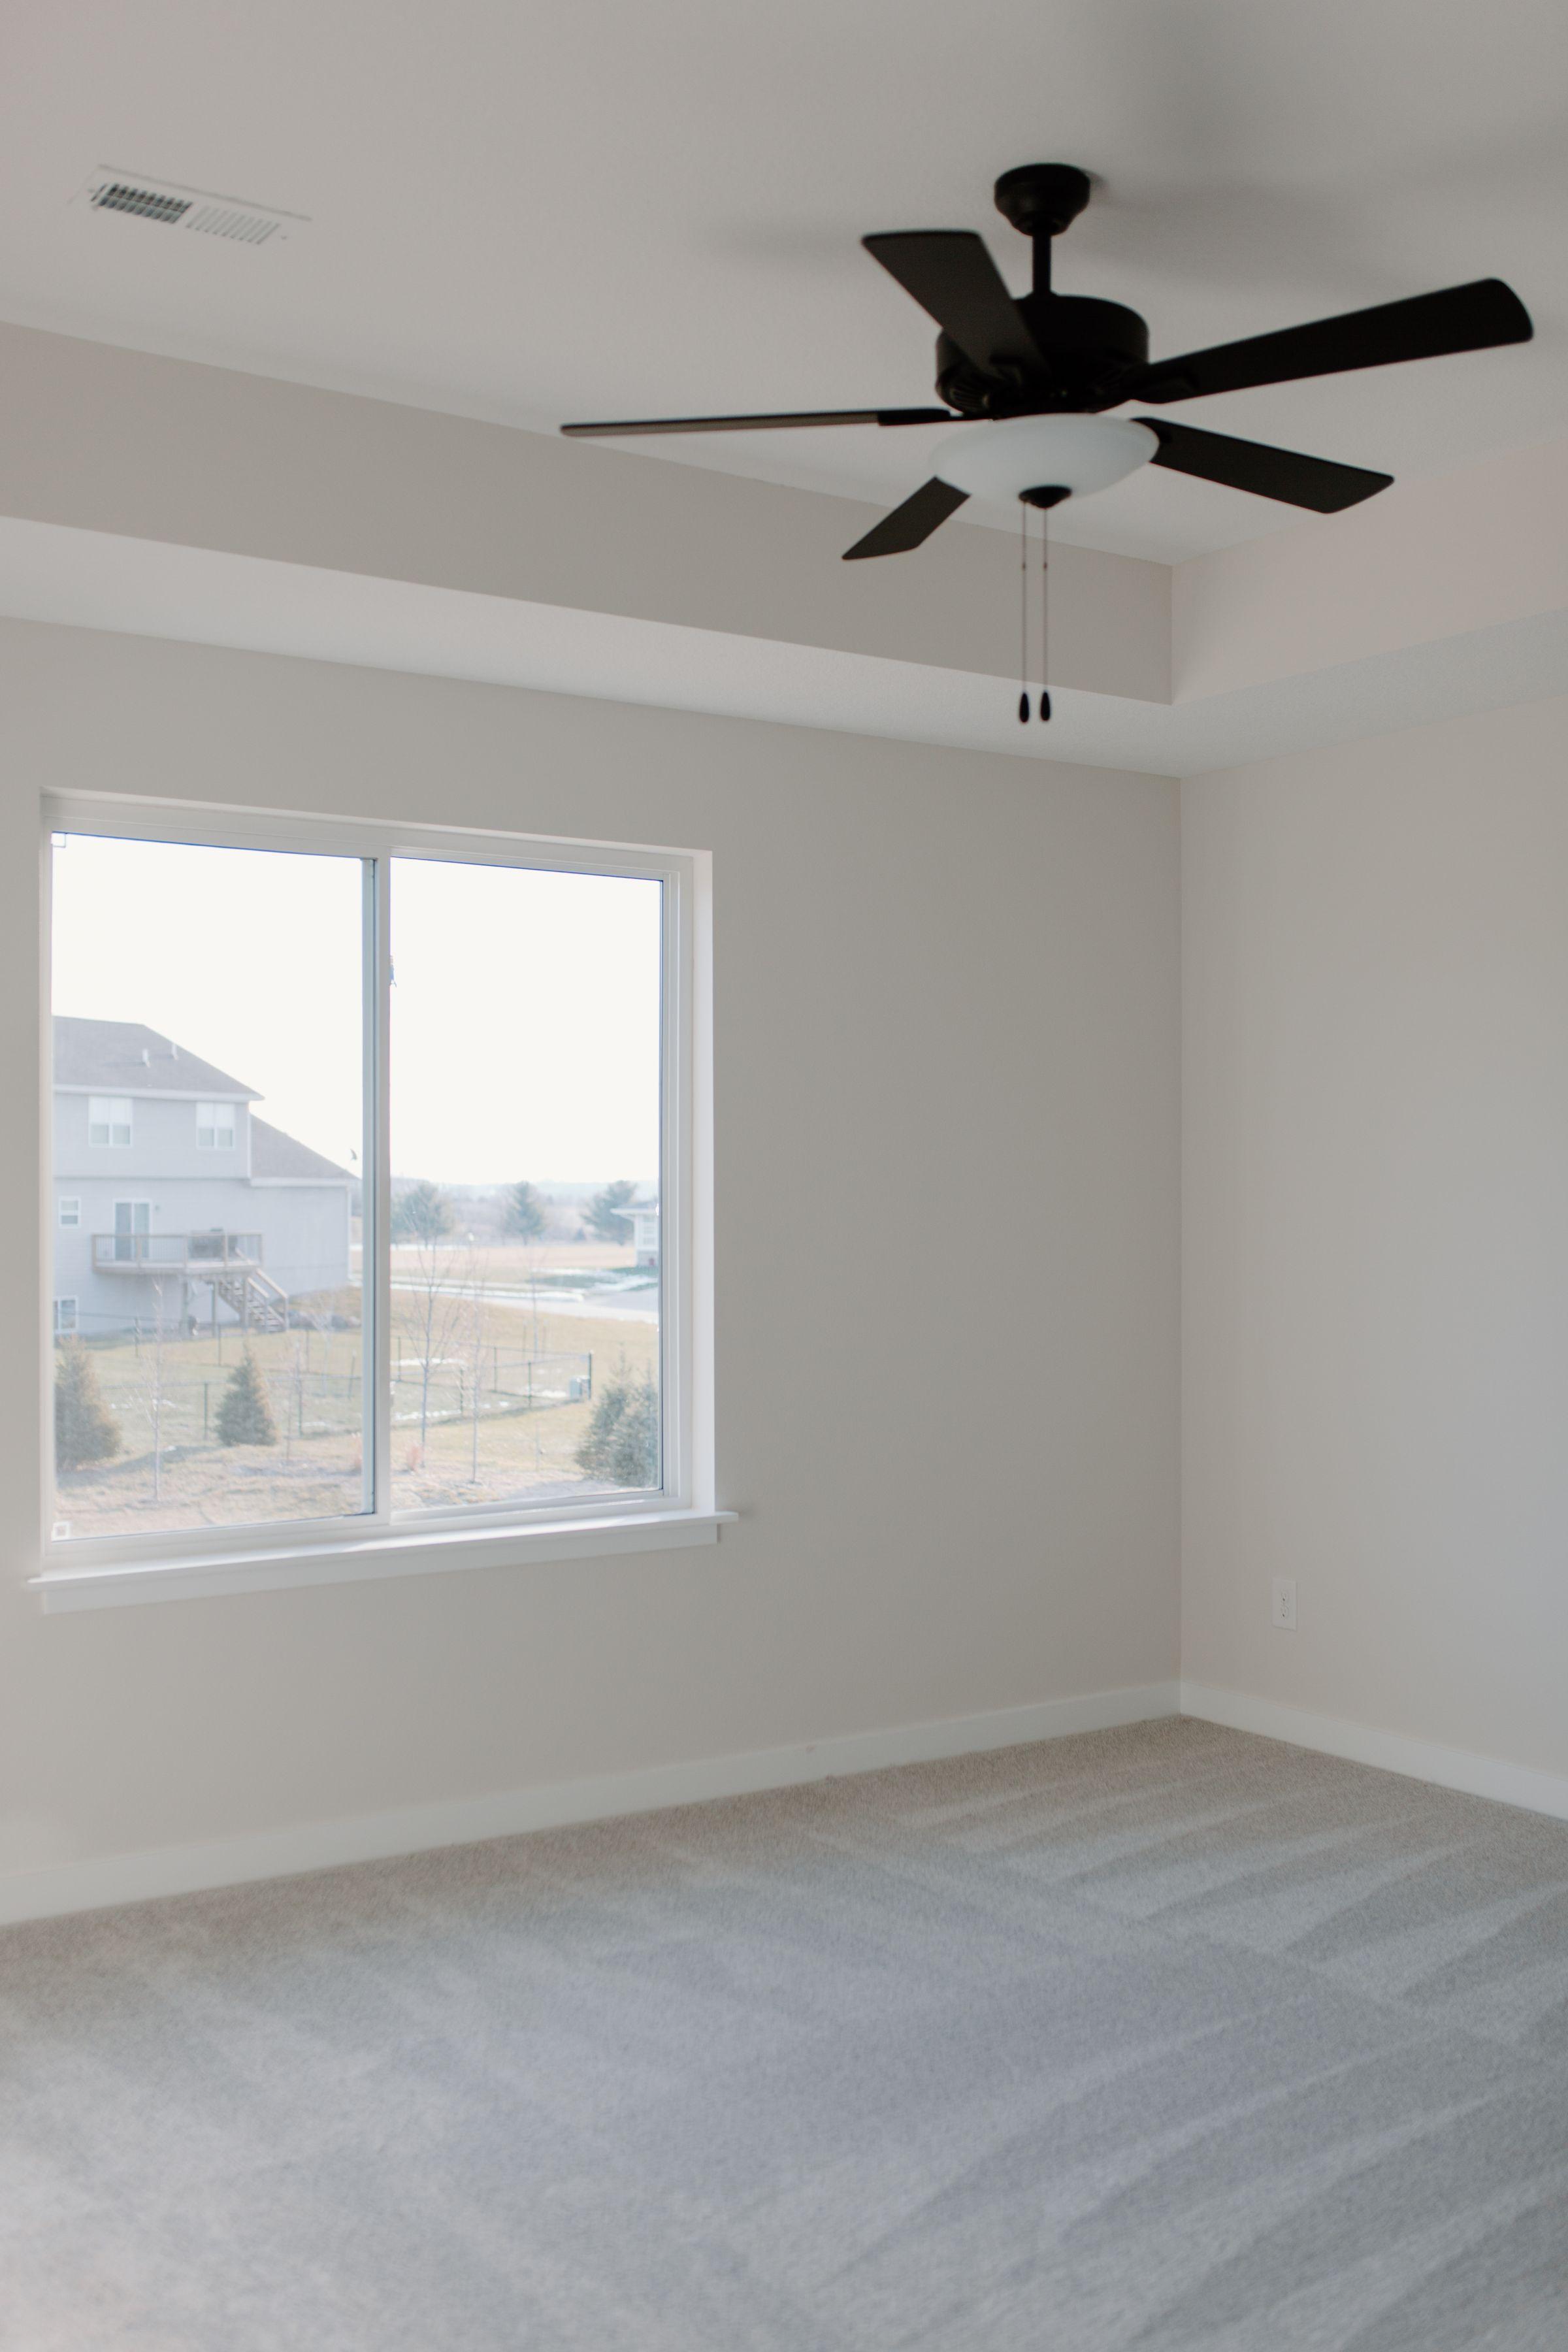 residential-warren-county-iowa-0-acres-listing-number-15138-6-2020-12-28-170355.jpg